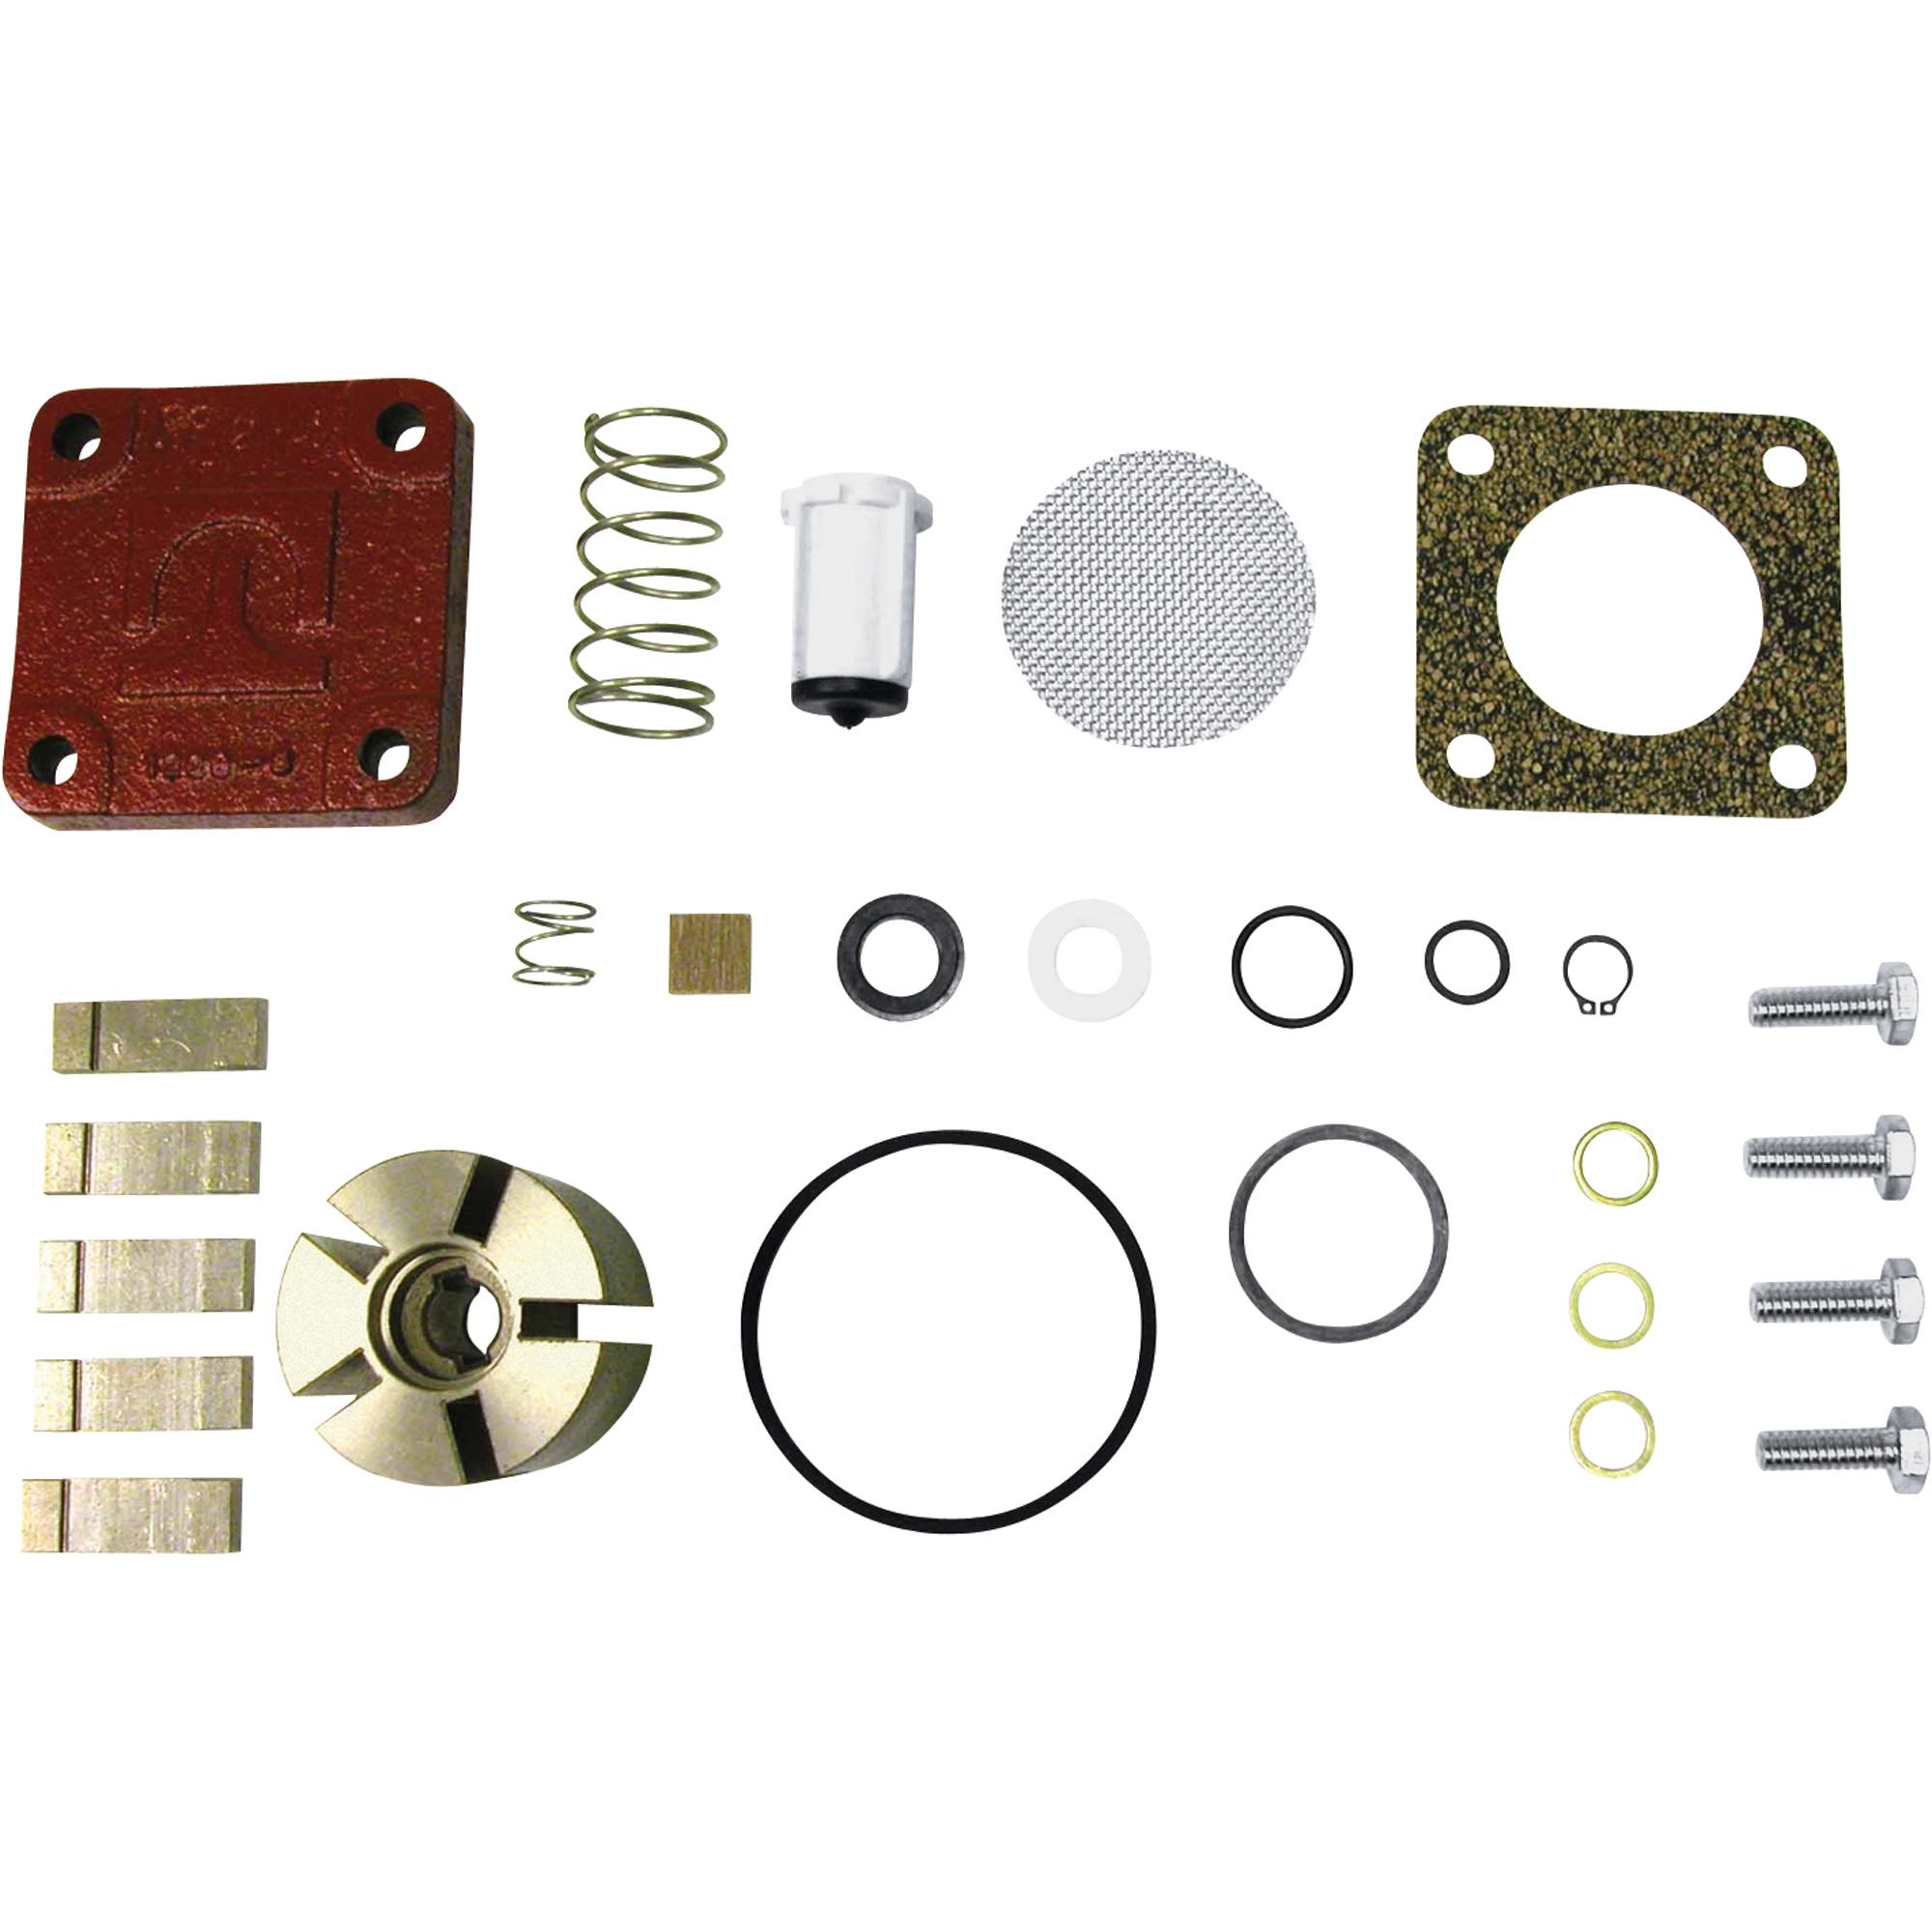 Fill Rite Fr1200c Wiring Diagram Fill Rite Pump Parts List